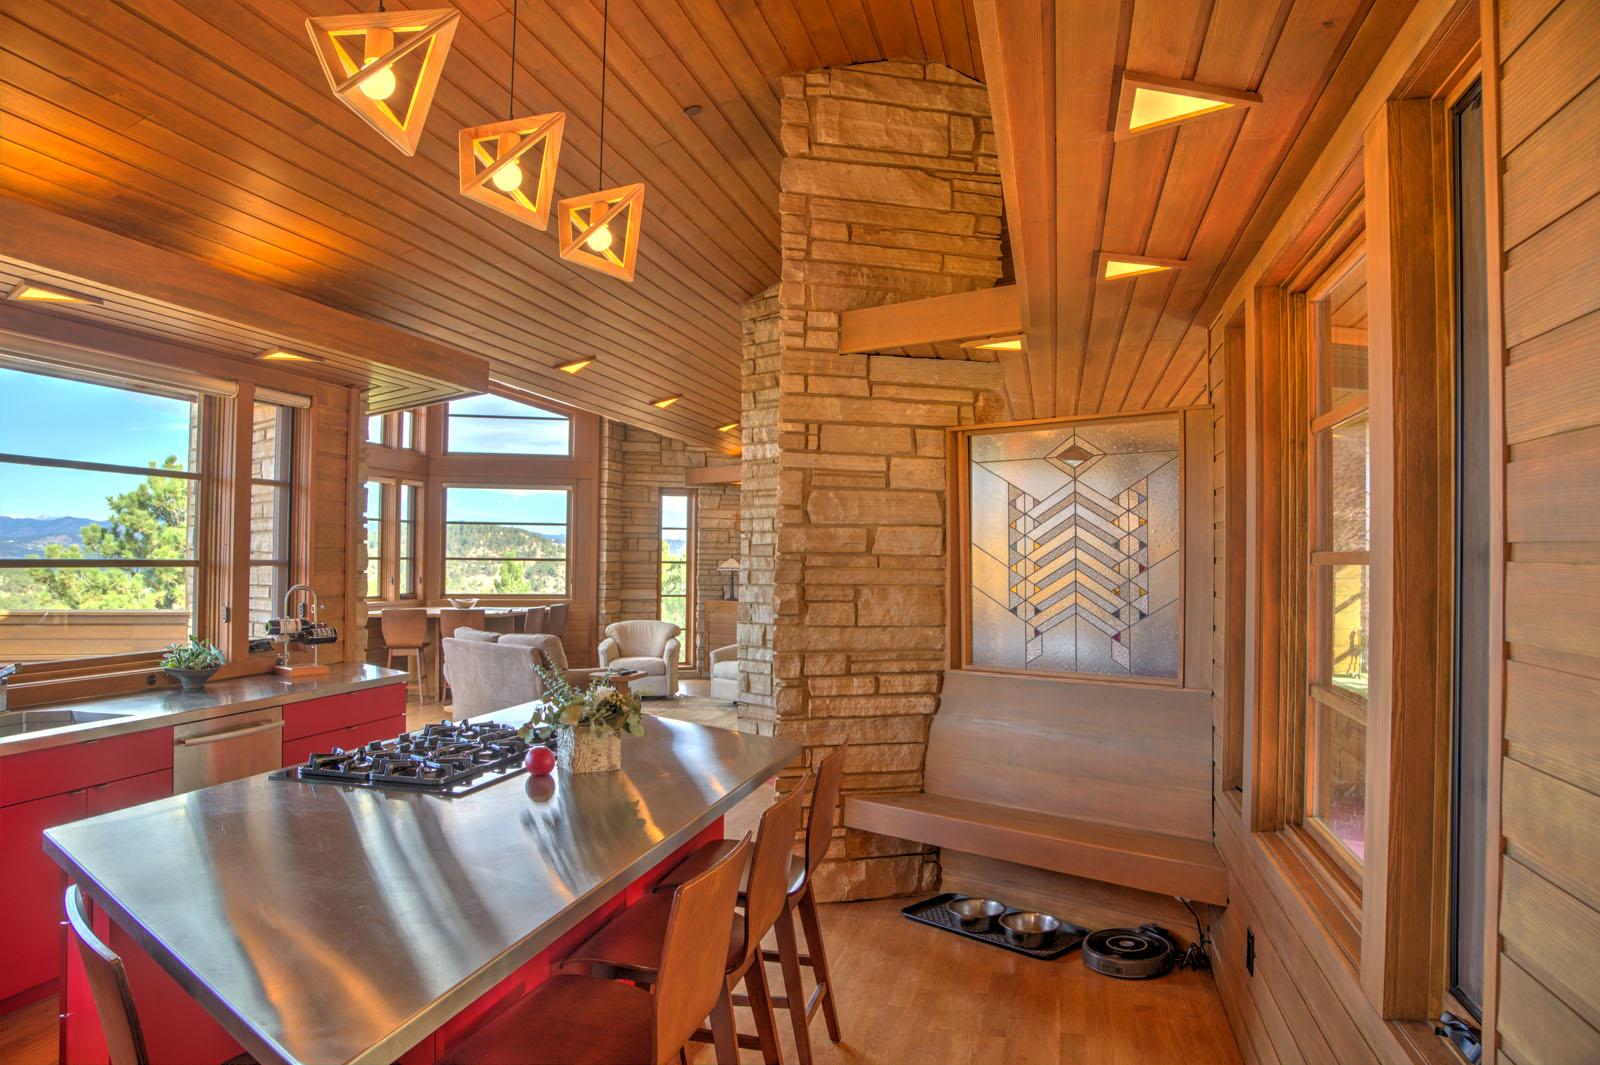 http://scdac.com/wp/wp-content/uploads/2P4A8172_3_4_5_6_7_8_Steves-FLW-House-Interior-2.jpg